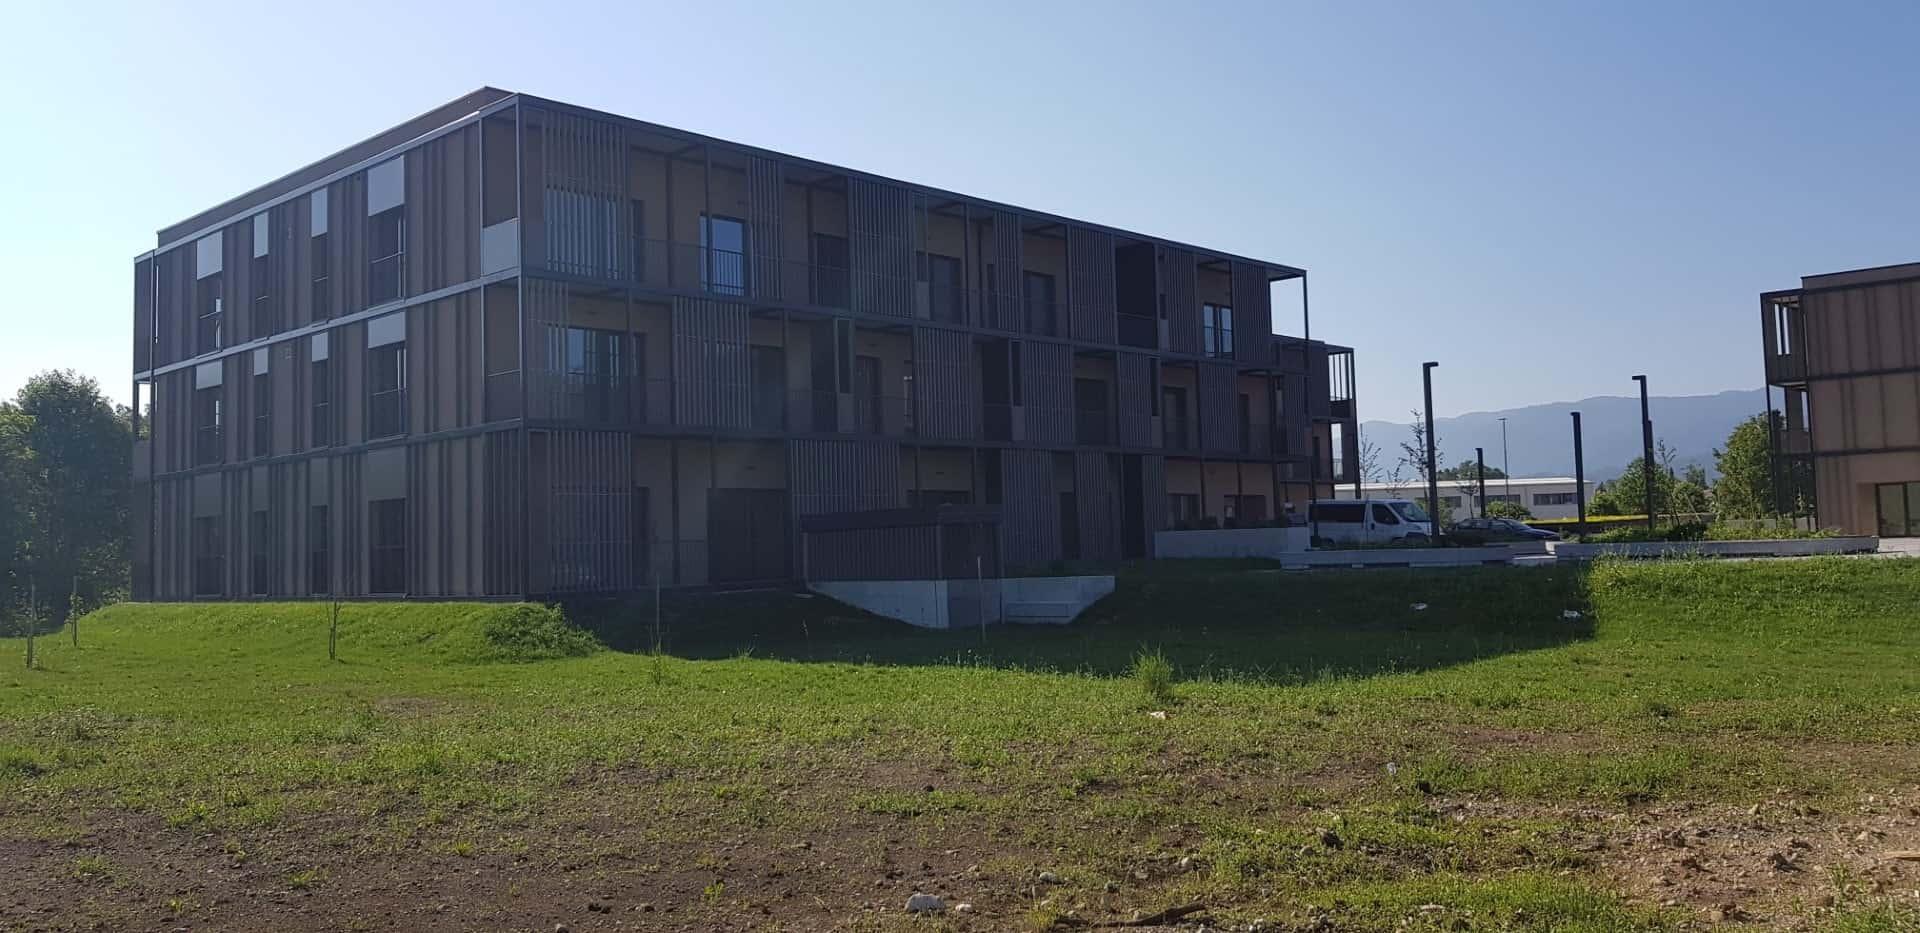 Permal doo reference Varovana stanovanja bled -1 2019 iMode d.o.o. (Large)